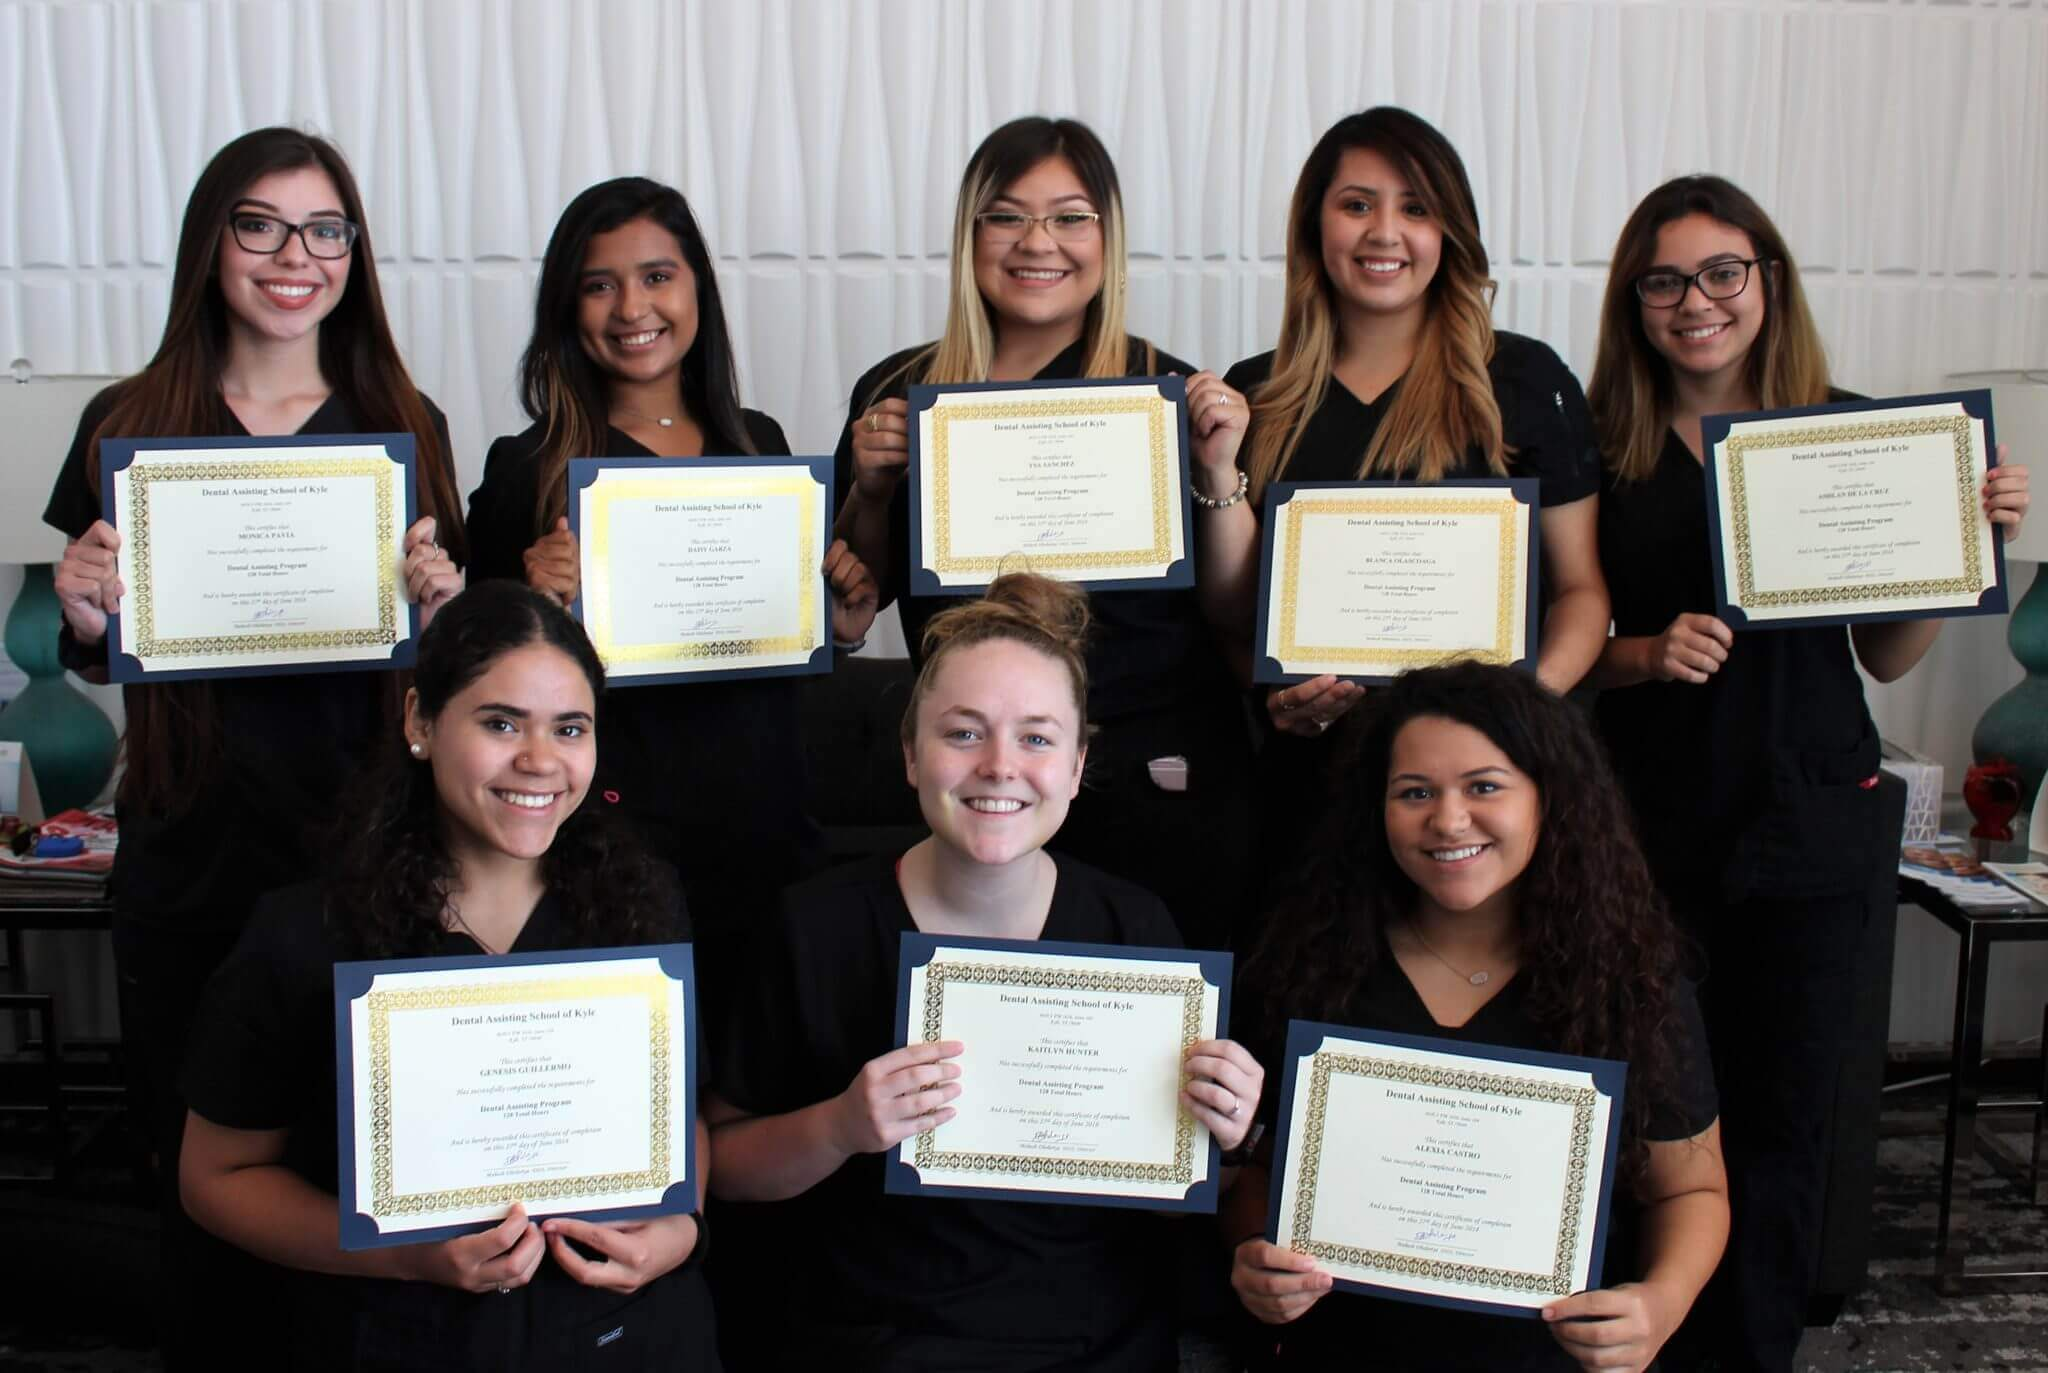 Austin Tx Dental Assistant School Program Kyle Dental Training Course